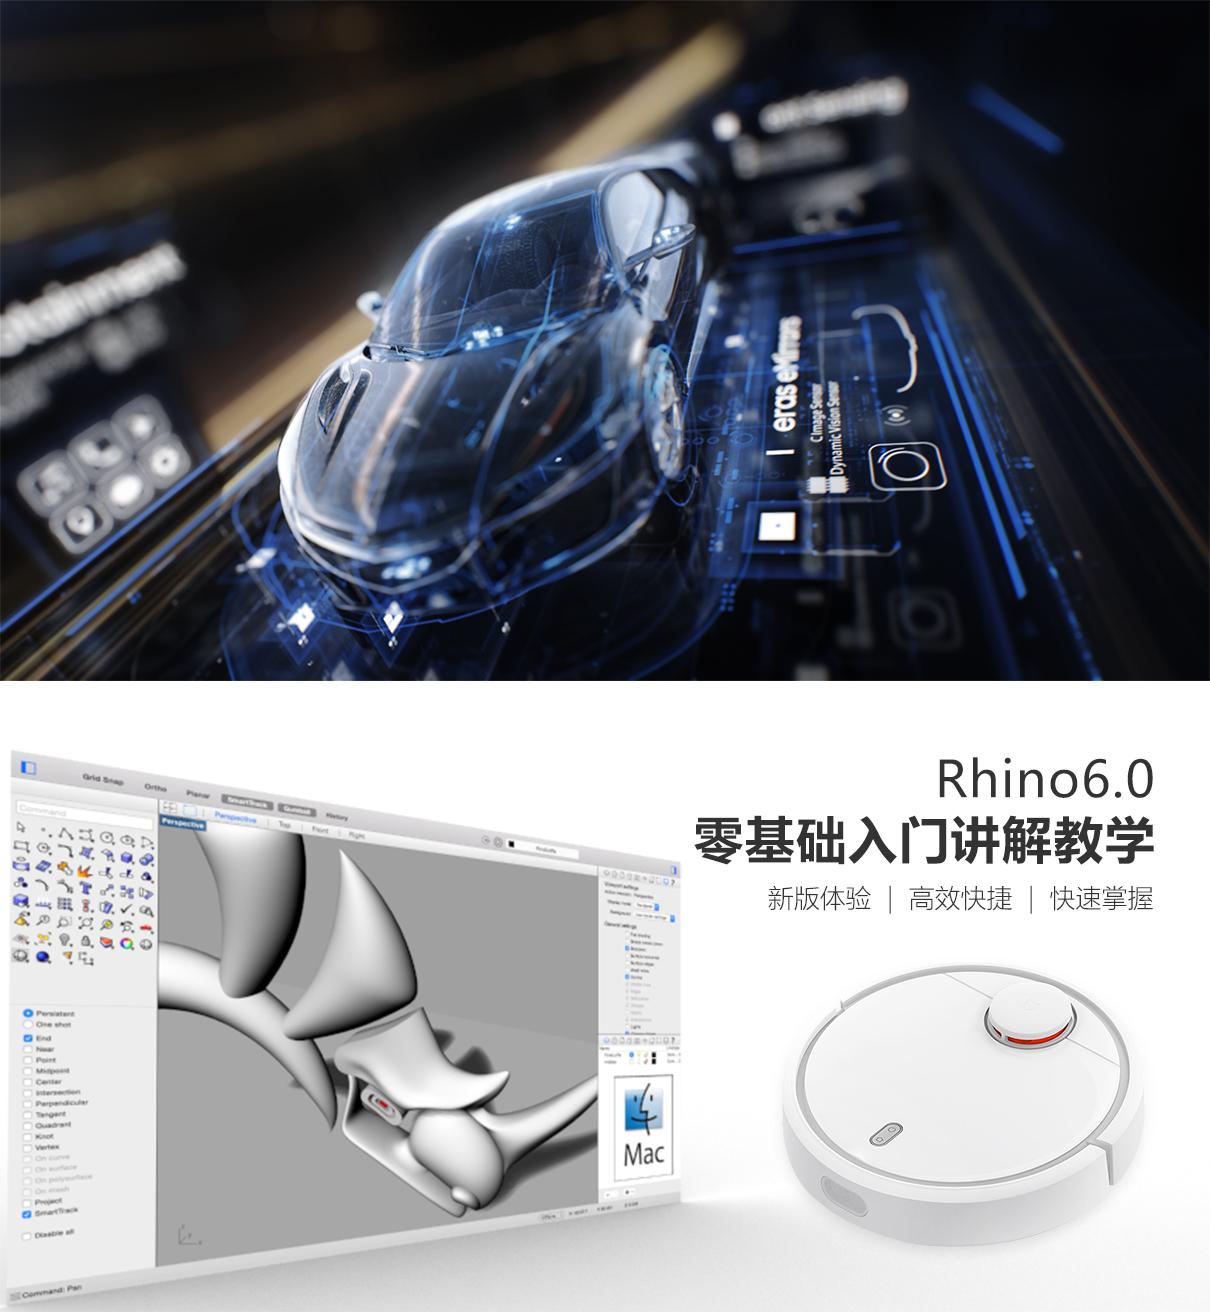 Rhino6.0零基础入门